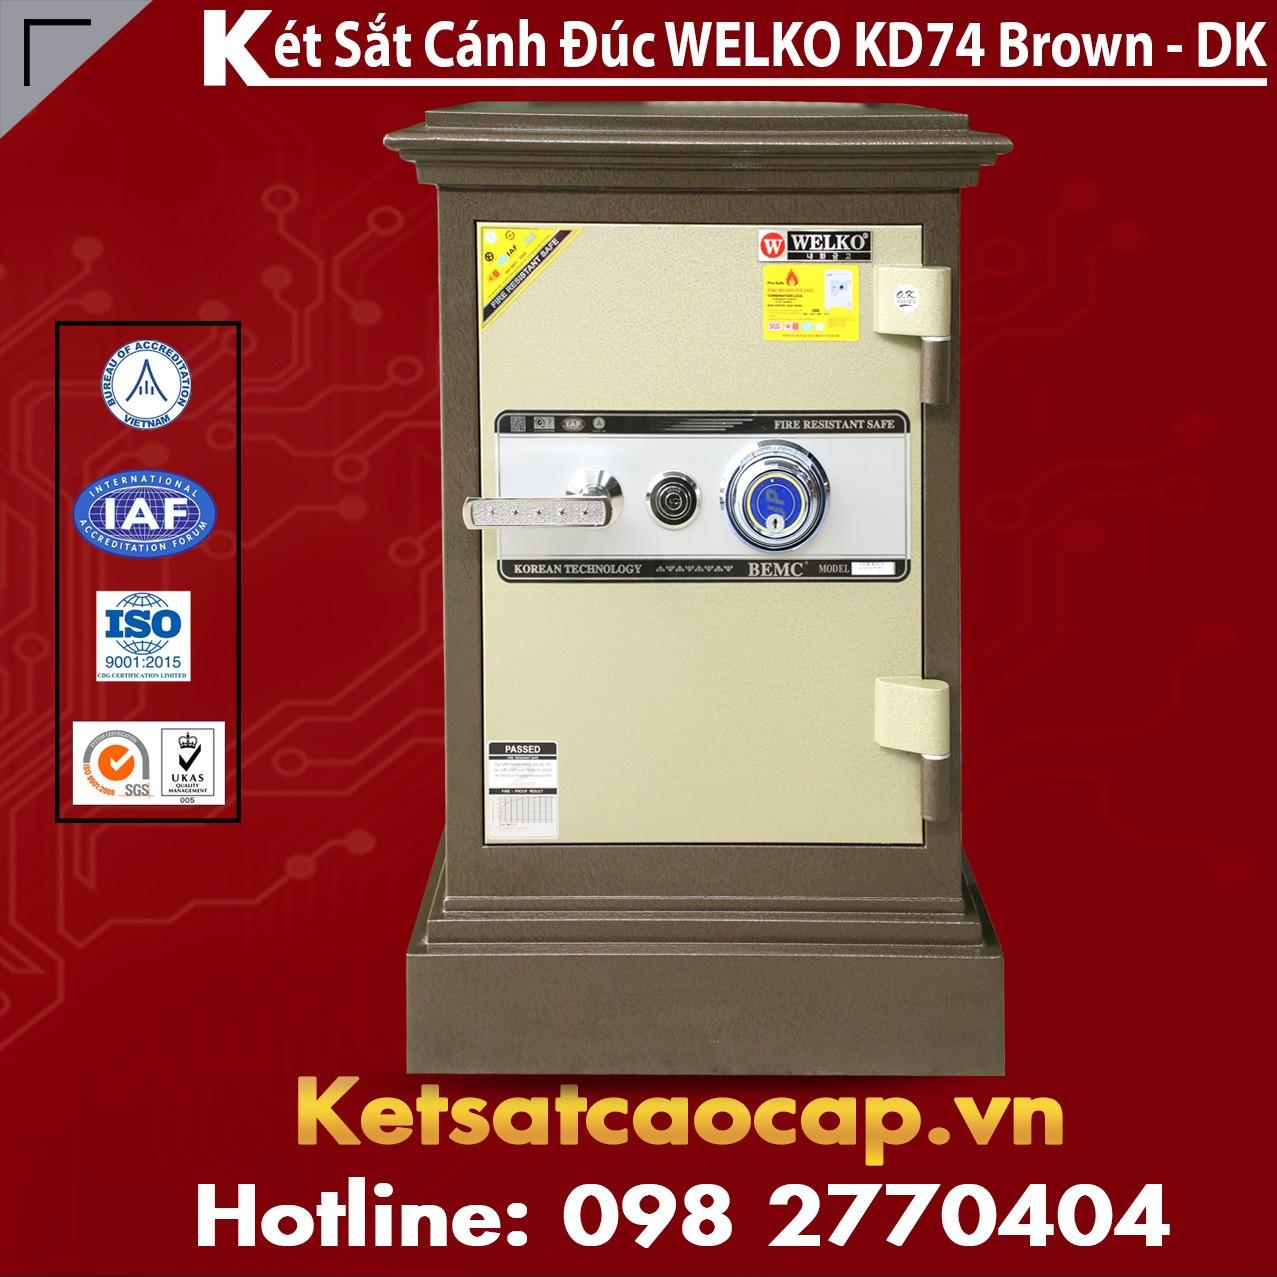 Két Sắt Mini Chính Hãng WELKO KD74 Brown - DK